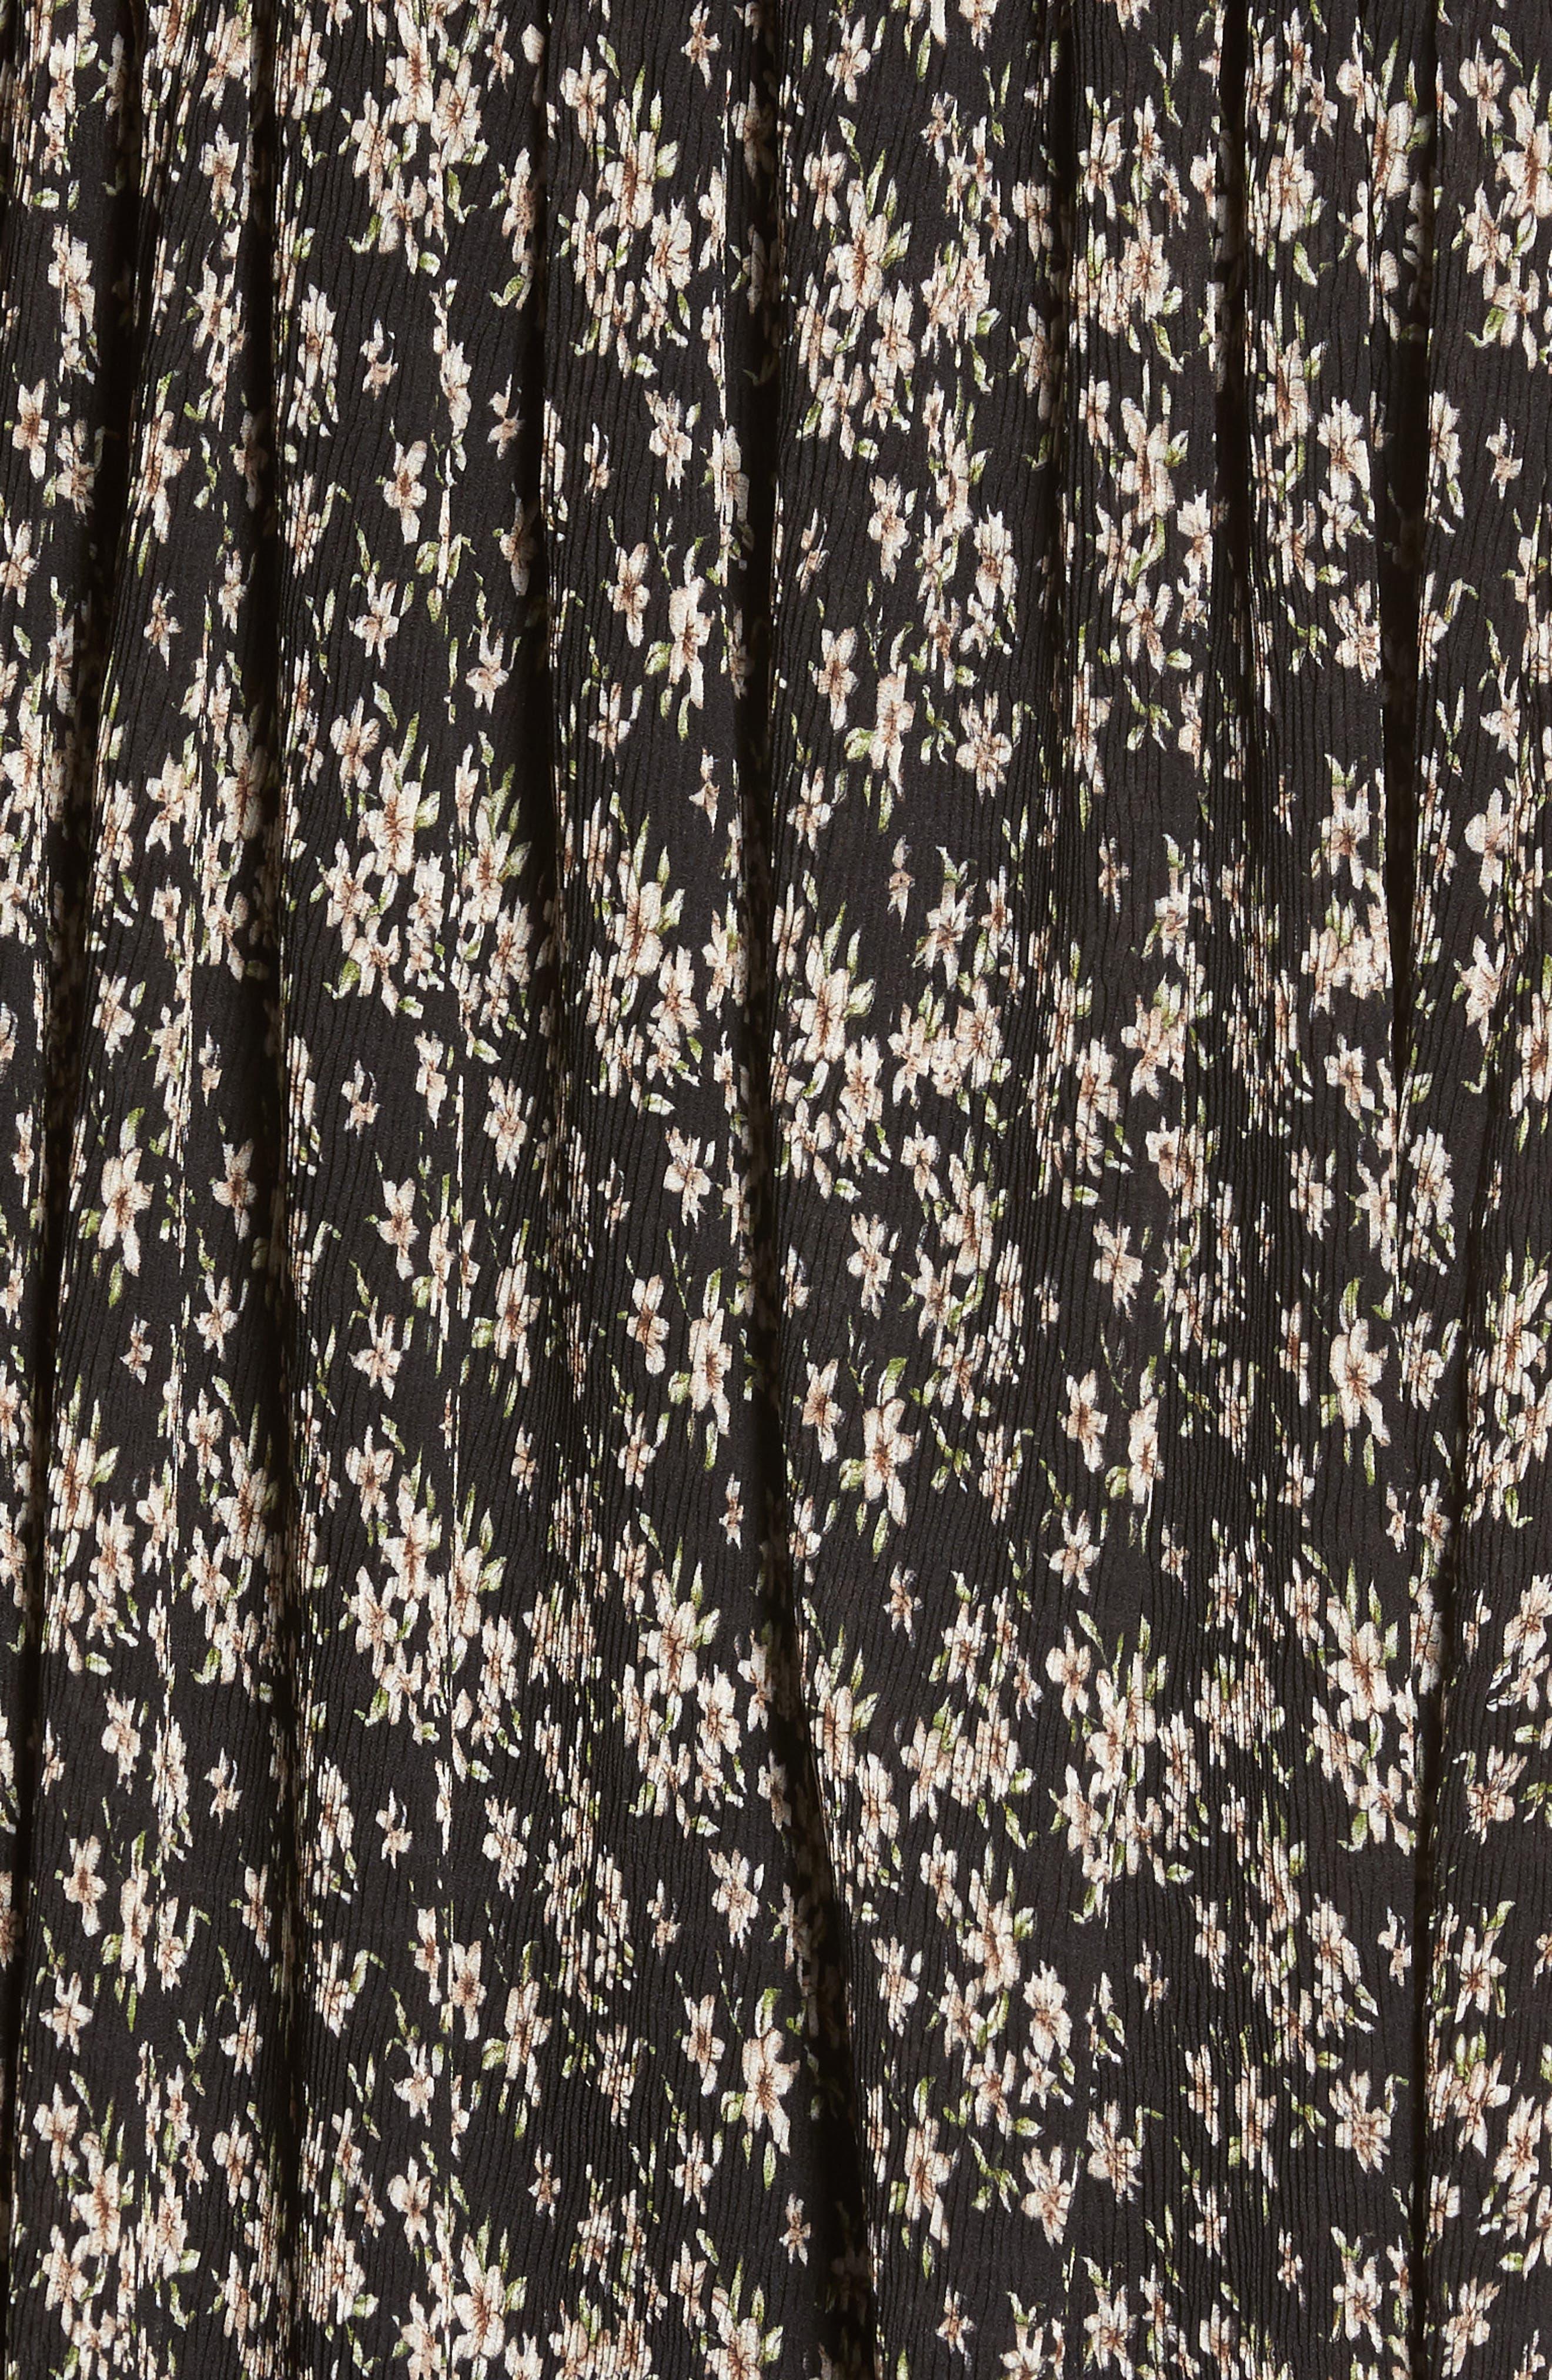 Floral Print Chiffon Top,                             Alternate thumbnail 5, color,                             Black Floral